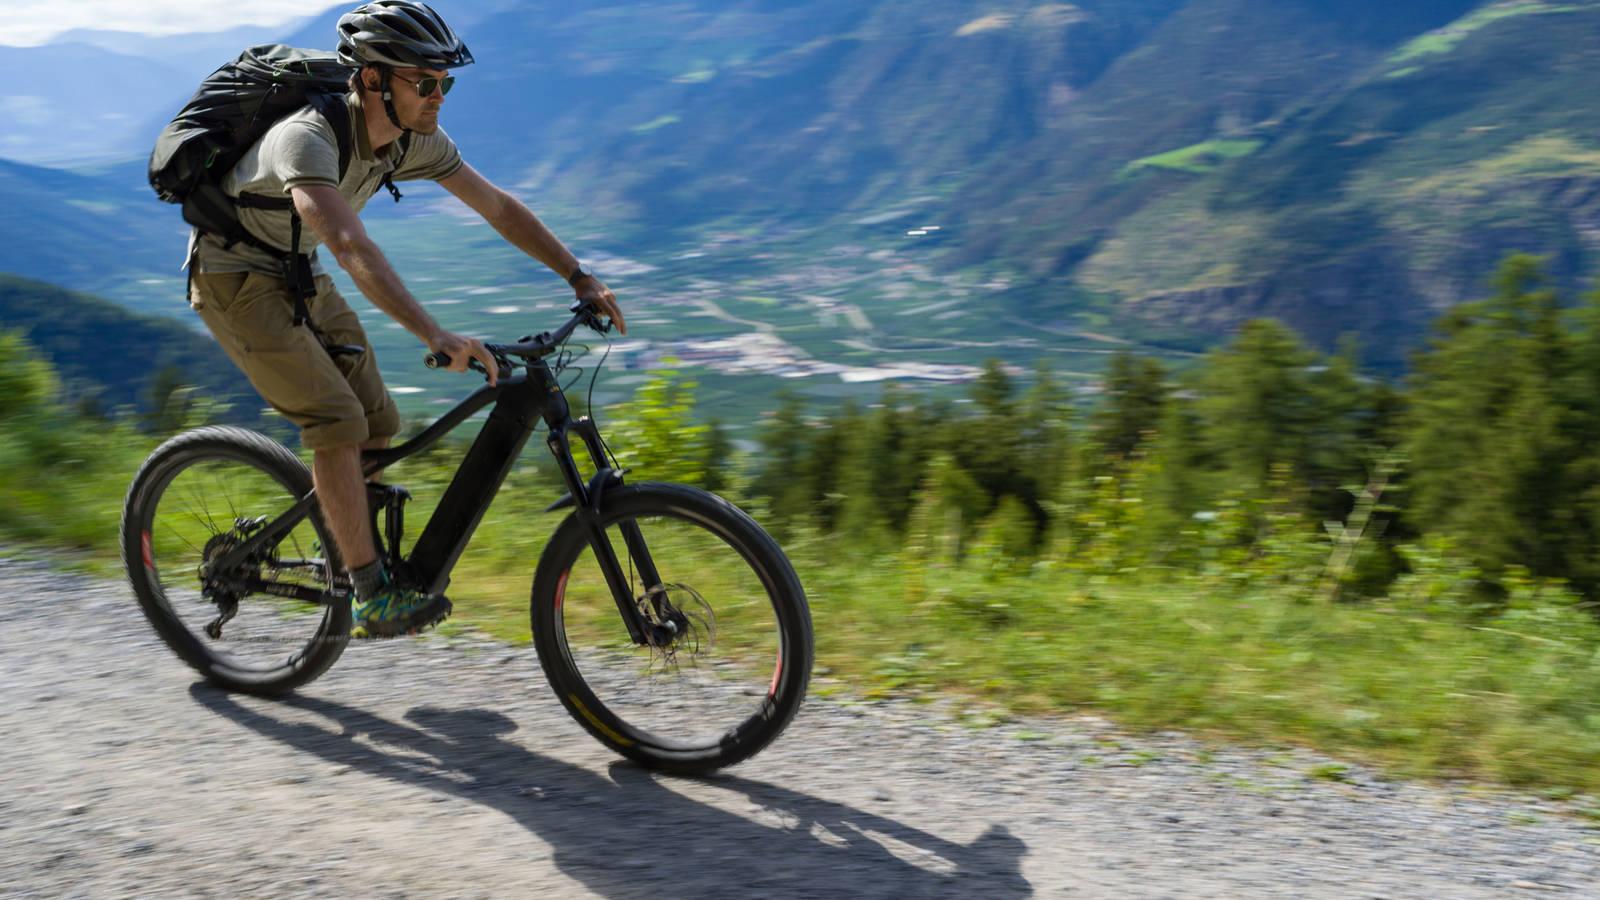 FAQ: Should the National Park Service Allow E-Bikes on Park